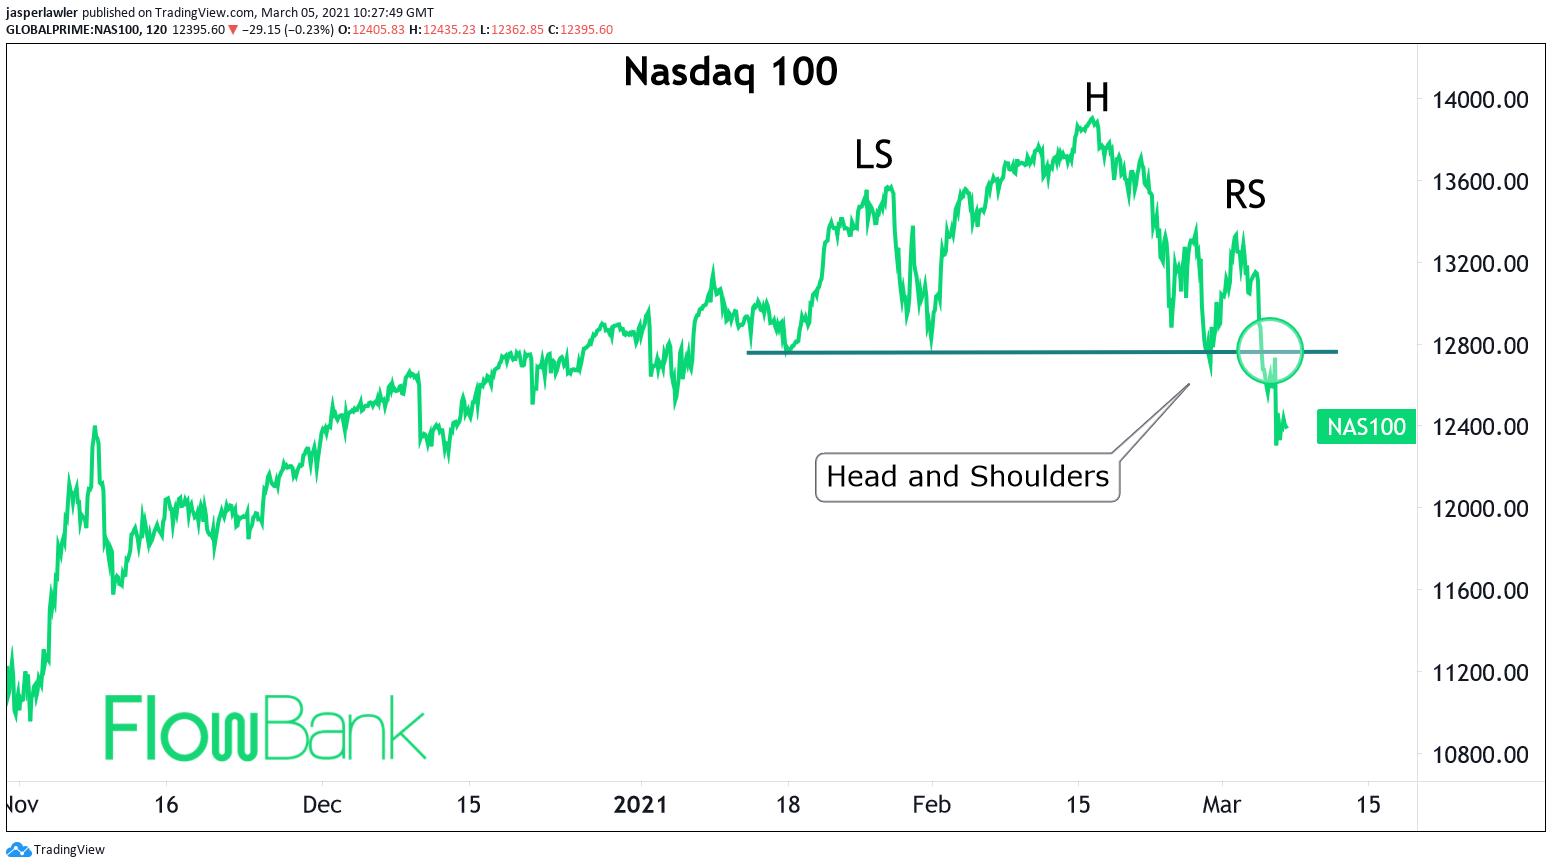 Nasdaq 100 completes Head & Shoulders reversal pattern